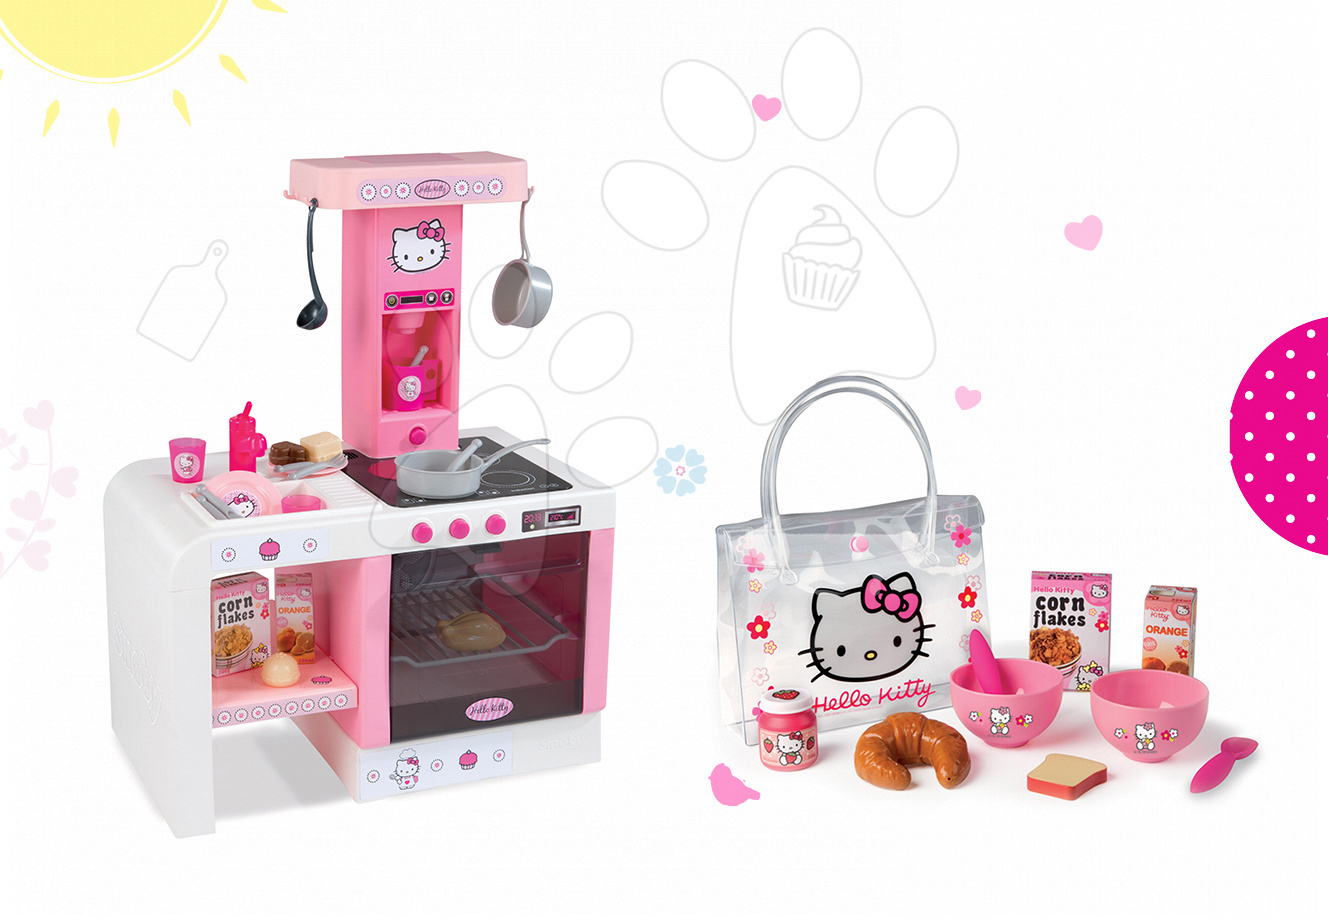 Smoby detská elektronická kuchynka Hello Kitty Cheftronic a raňajky v taške 24195-2